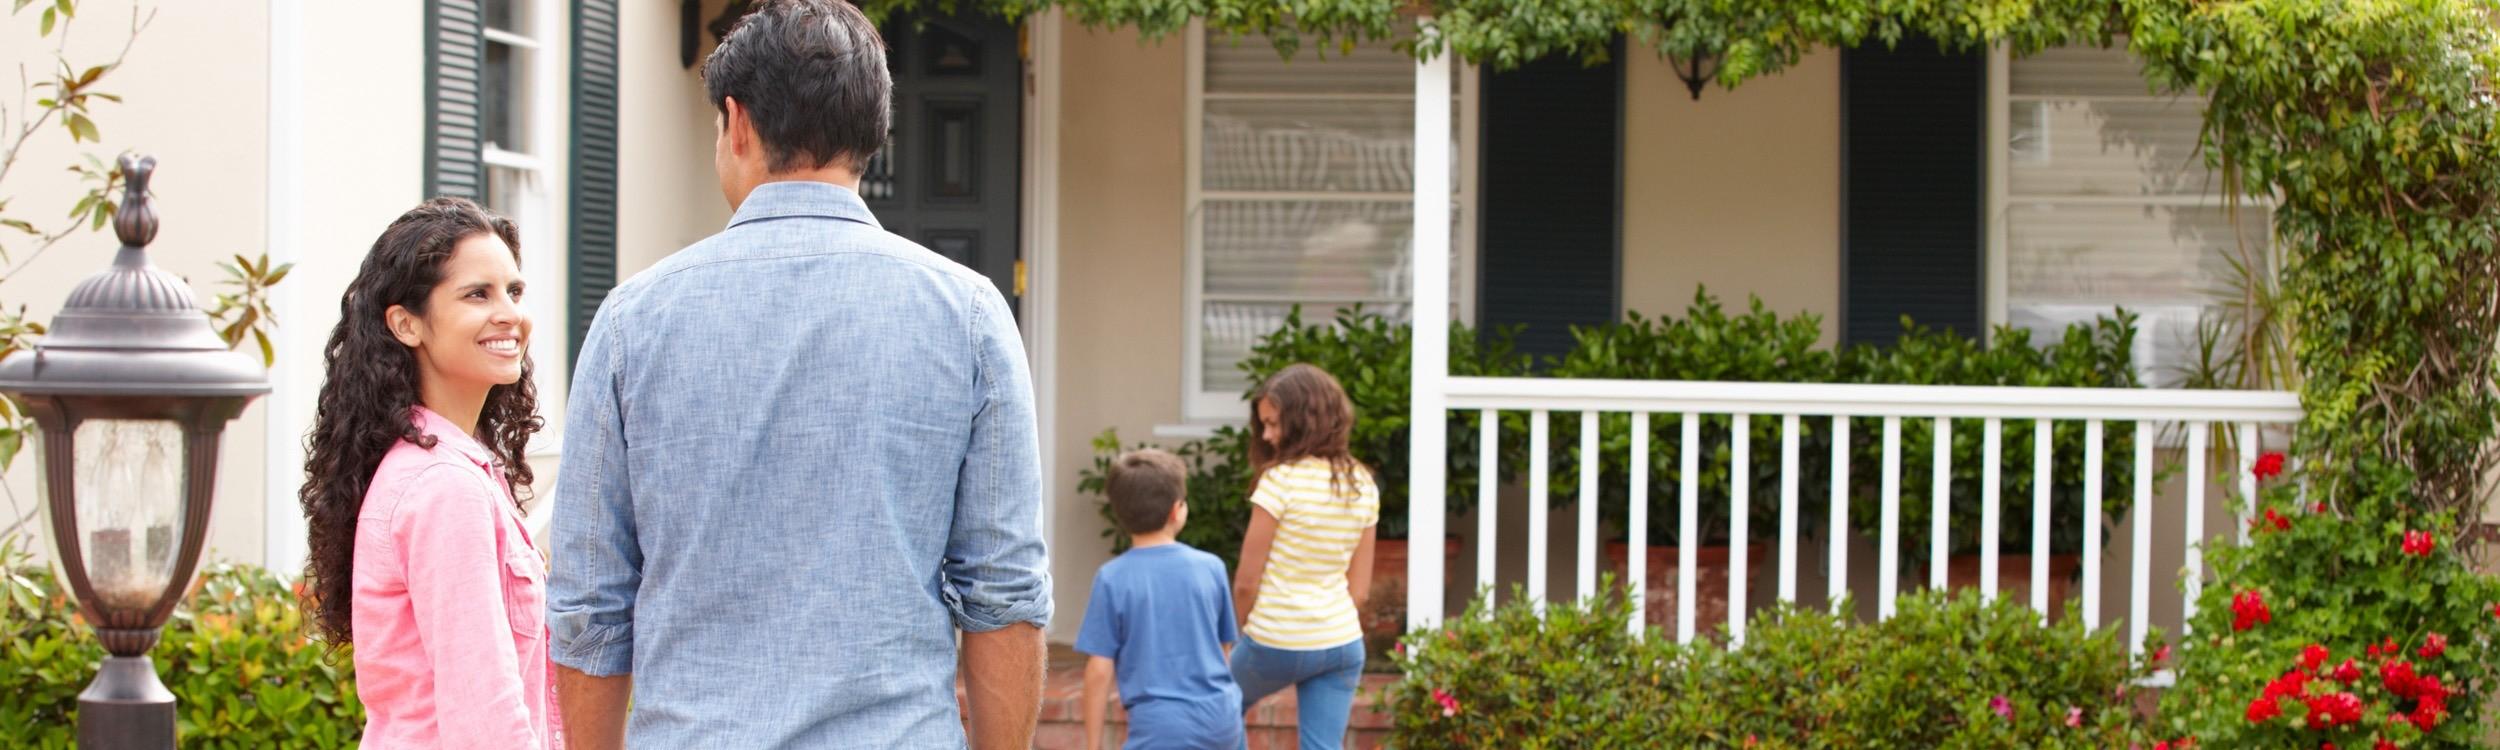 Apollo Single Family Homeowners Insurance